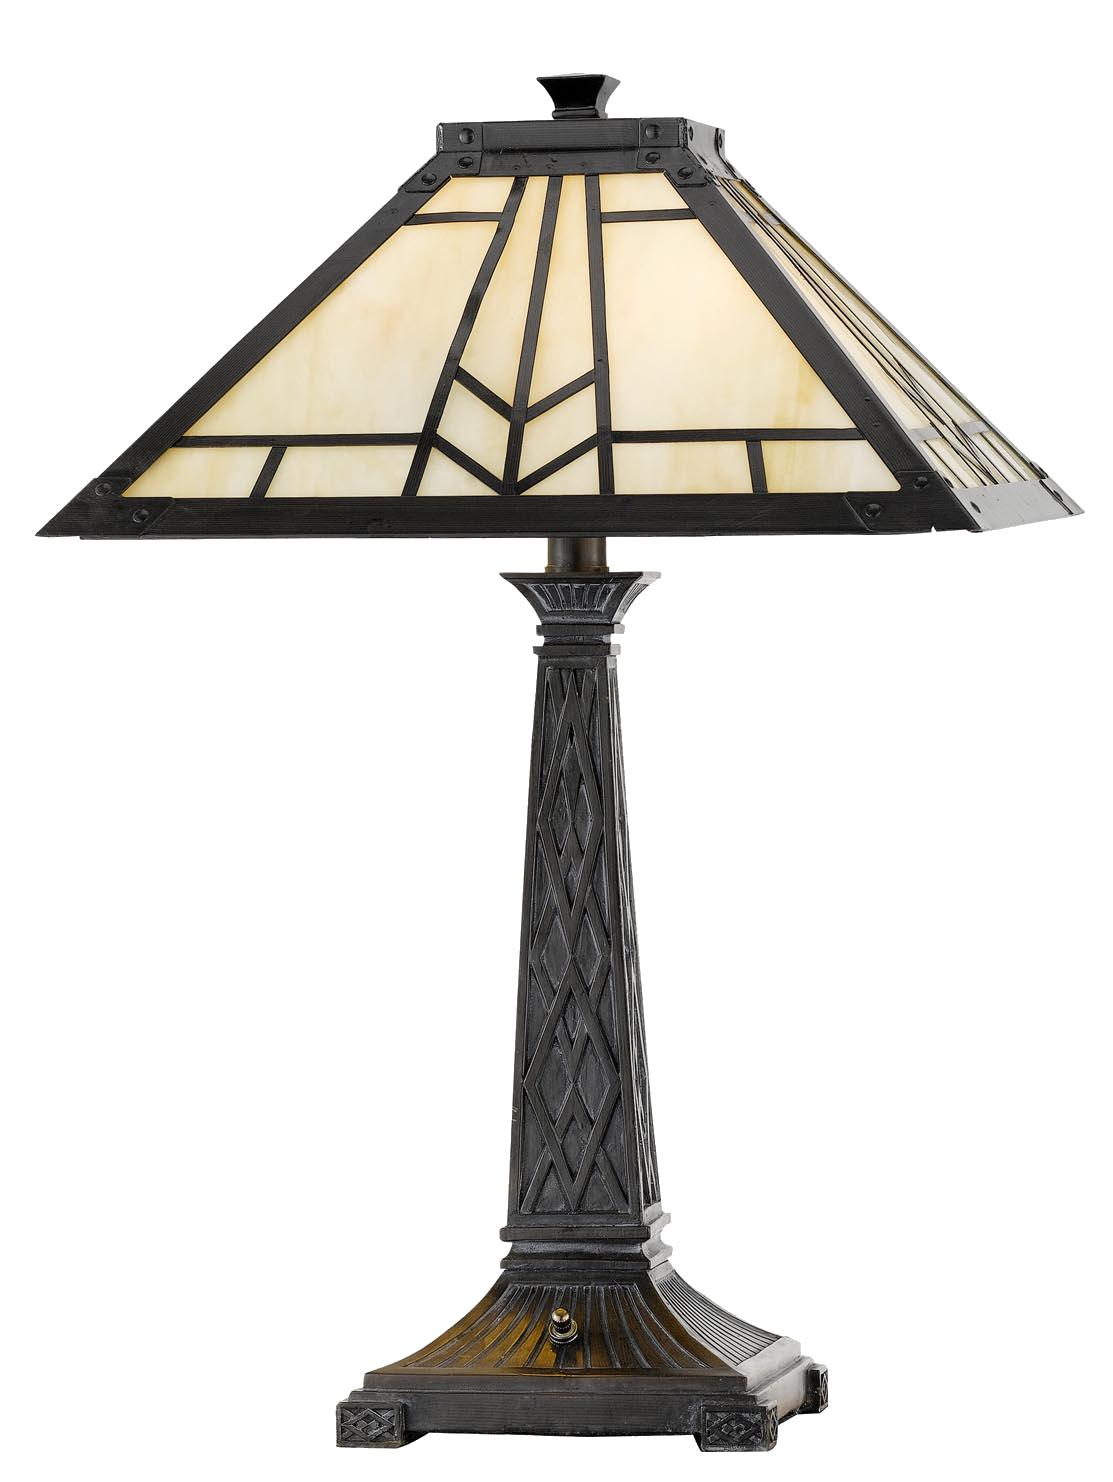 Cal Lighting 60w X 2 Mission Tiffany Table Lamp Urbane